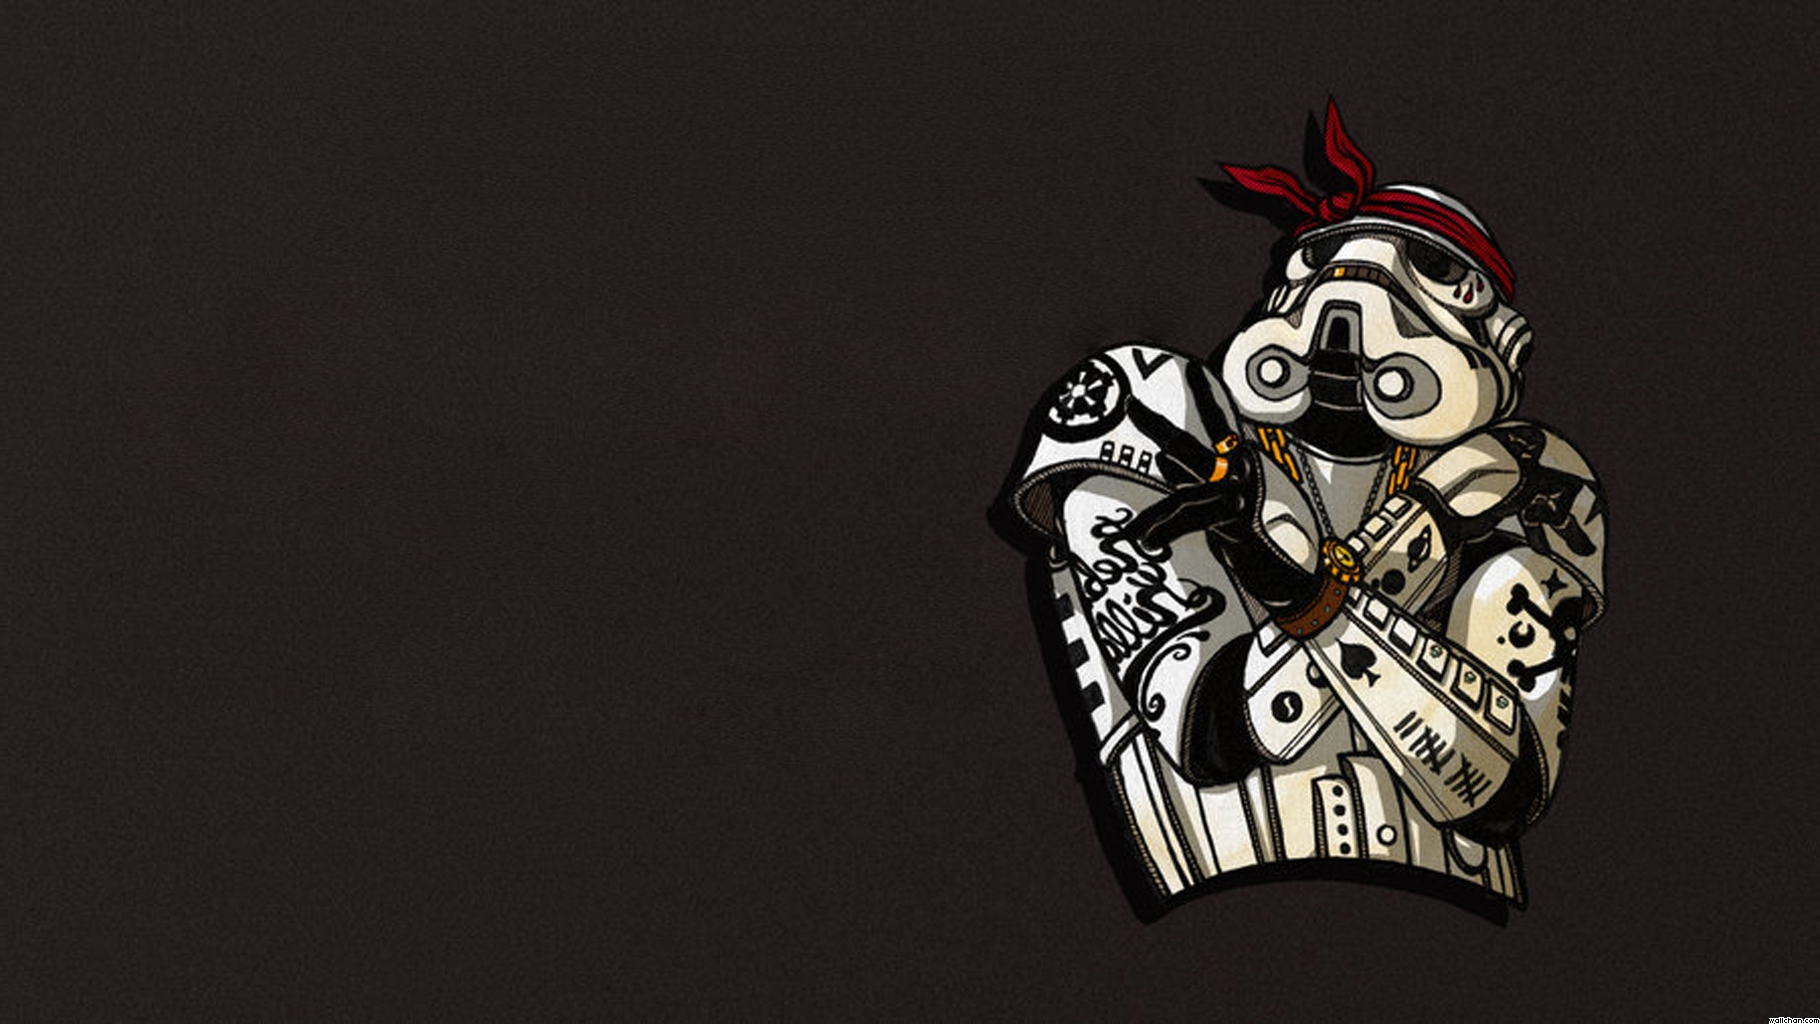 Funny Stormtrooper Wallpaper Gangsta Cover Photos For Facebook 1820x1024 Wallpaper Teahub Io